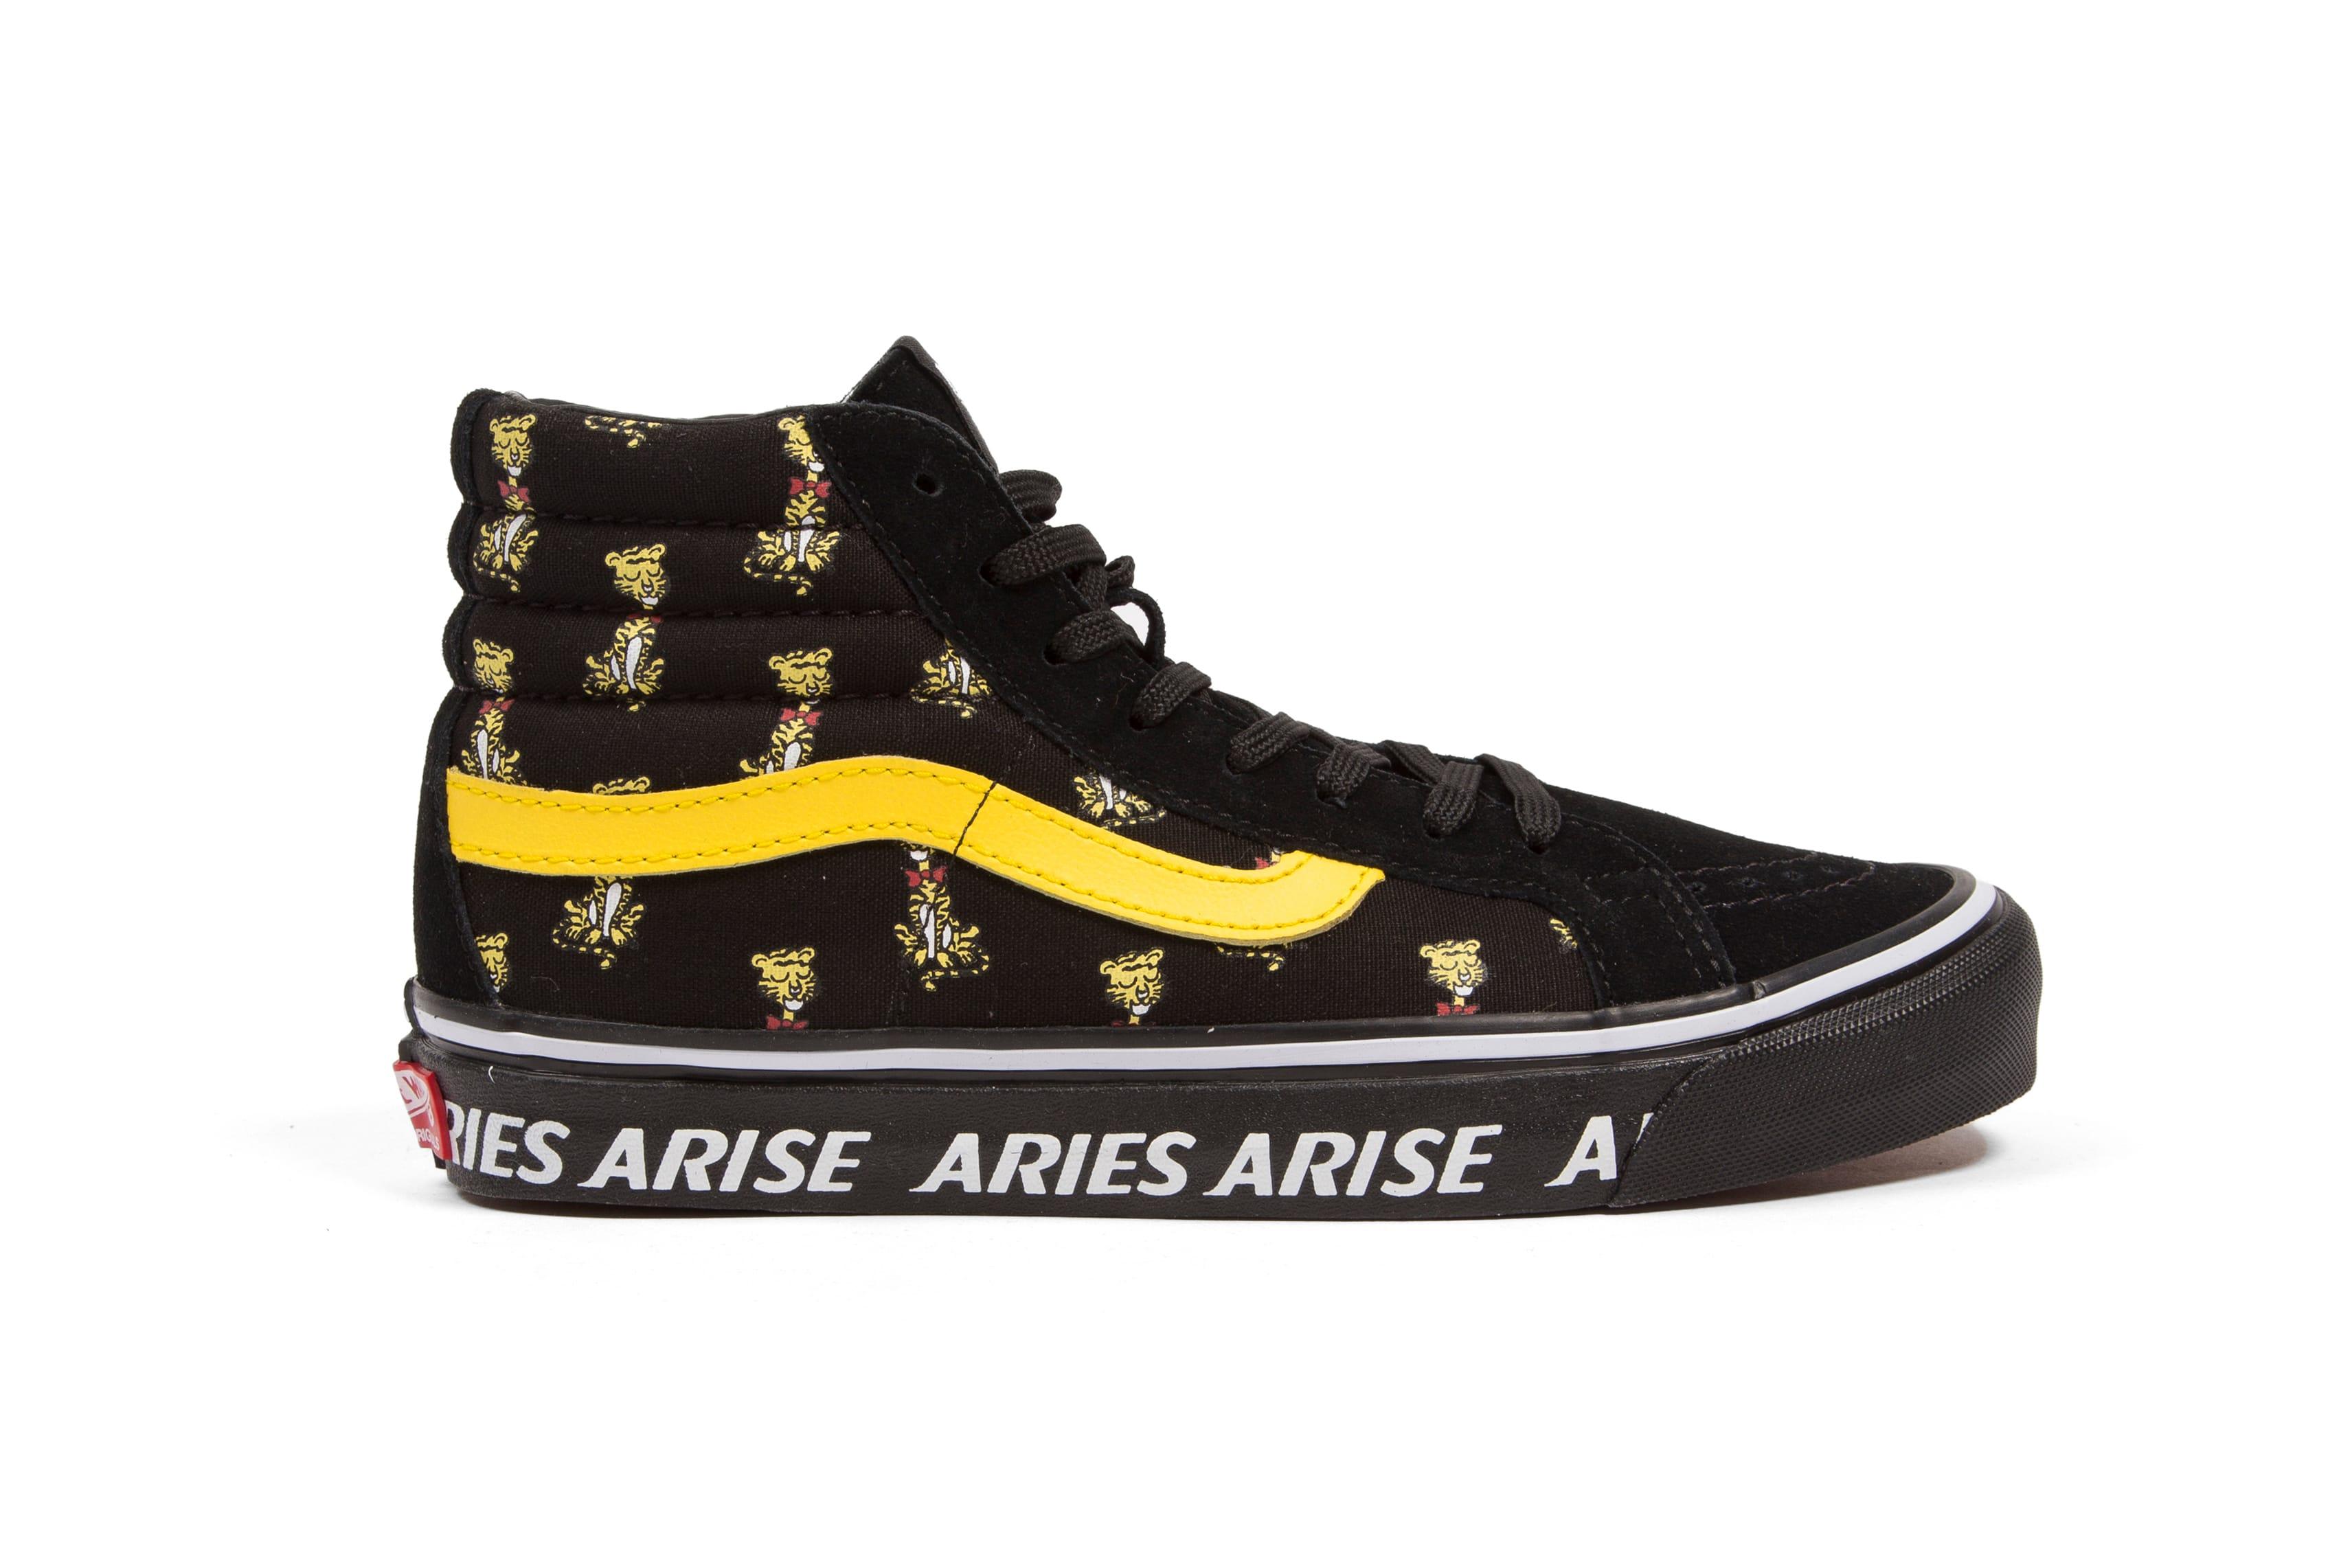 Aries x Vans Limited Edition Capsule